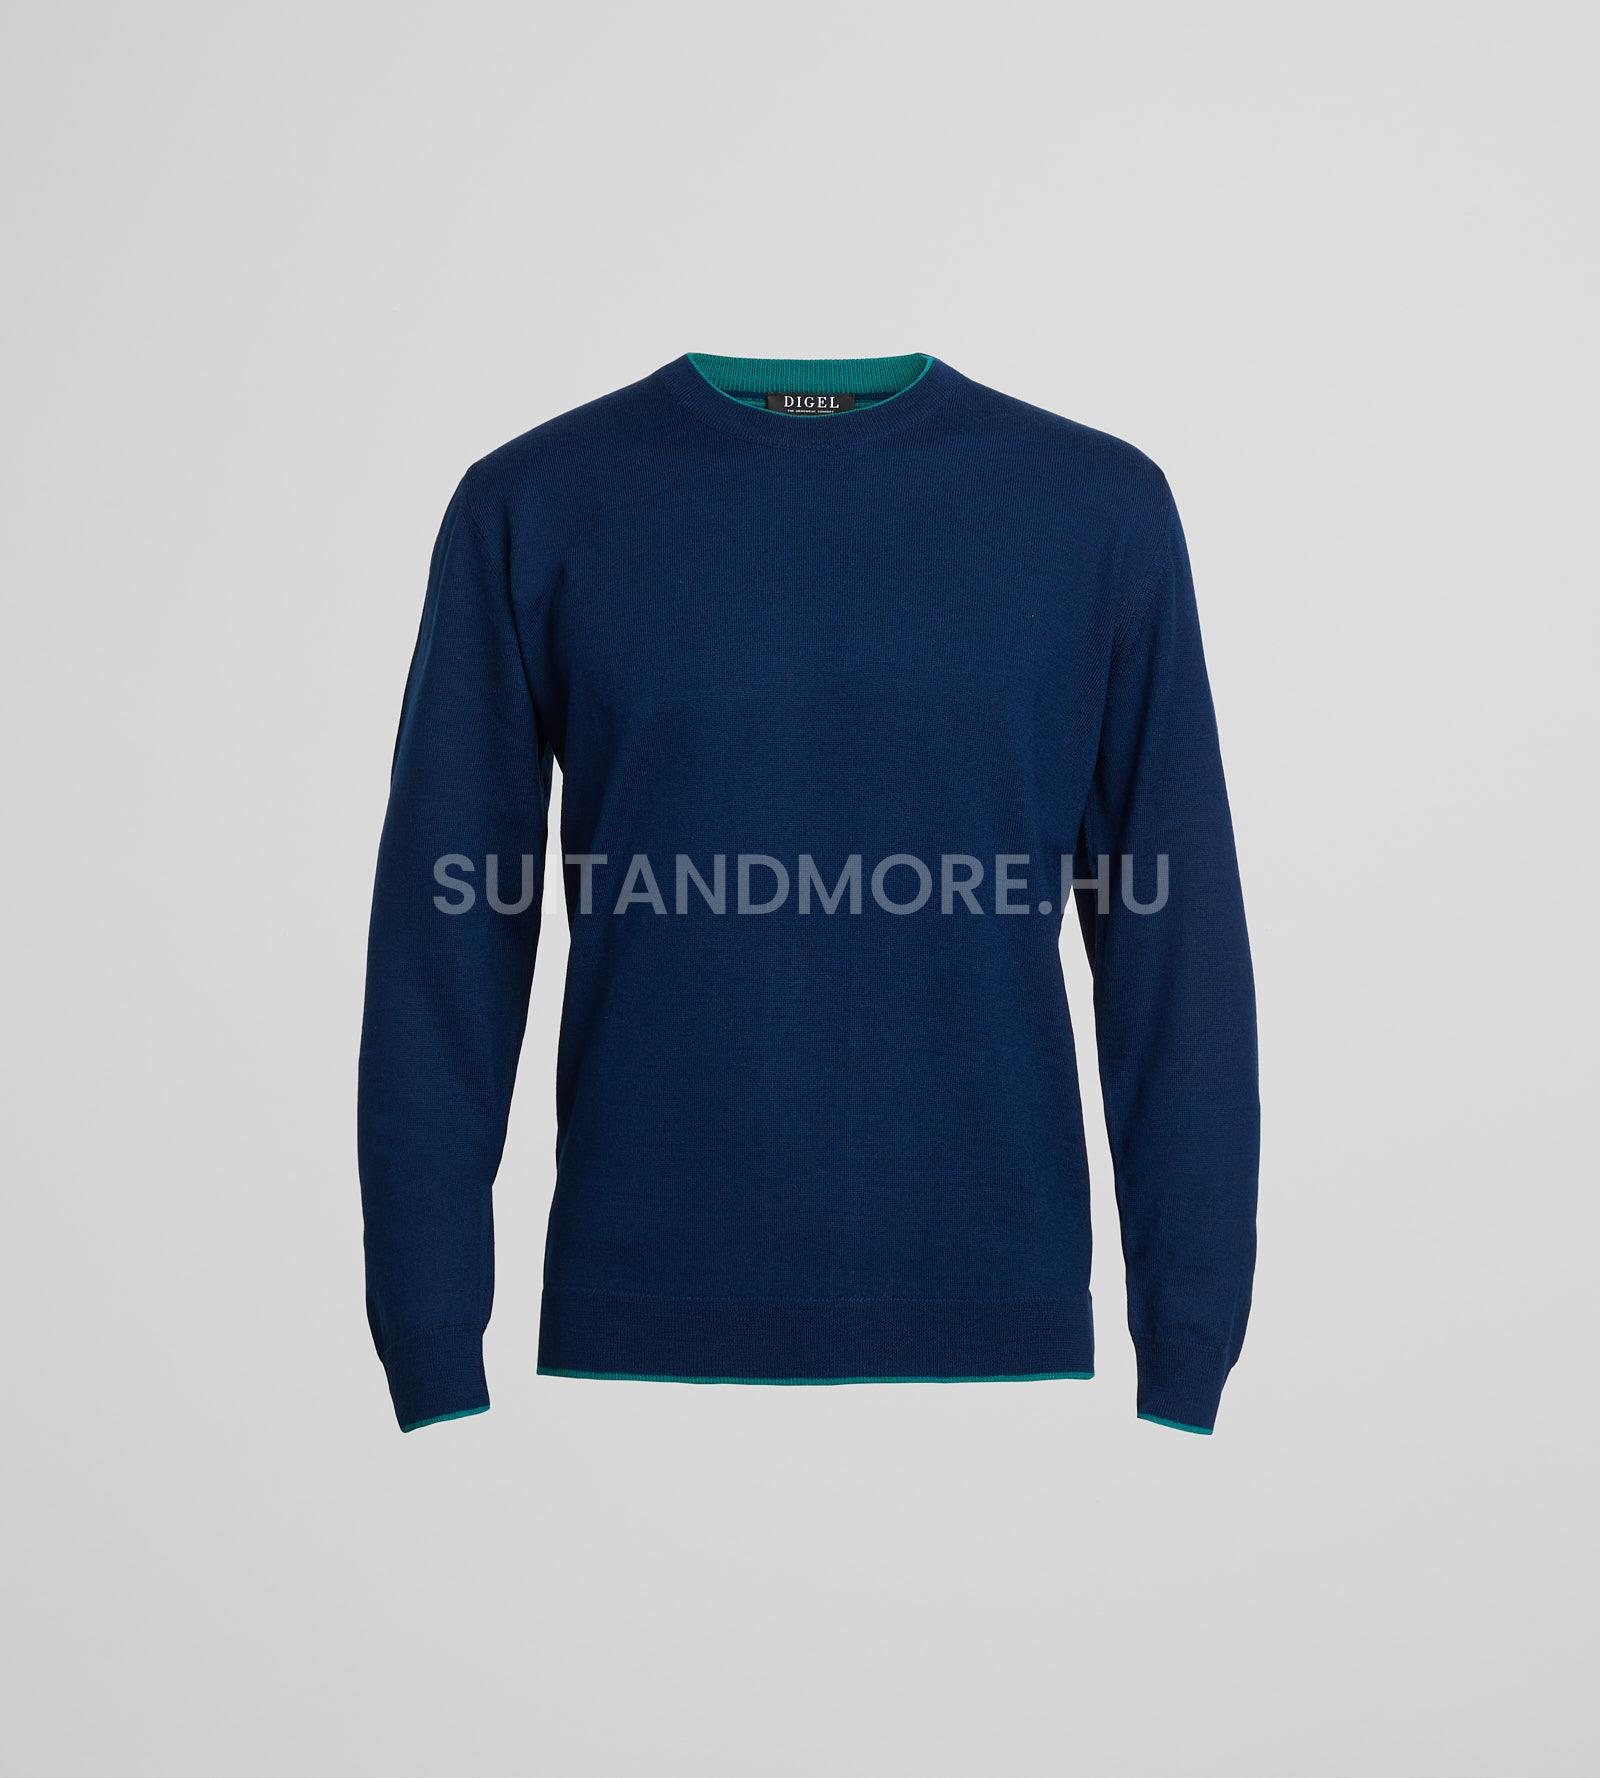 digel-tengereszkek-modern-fit-kerek-nyaku-gyapju-pulover-faros1-1-1298004-20-01